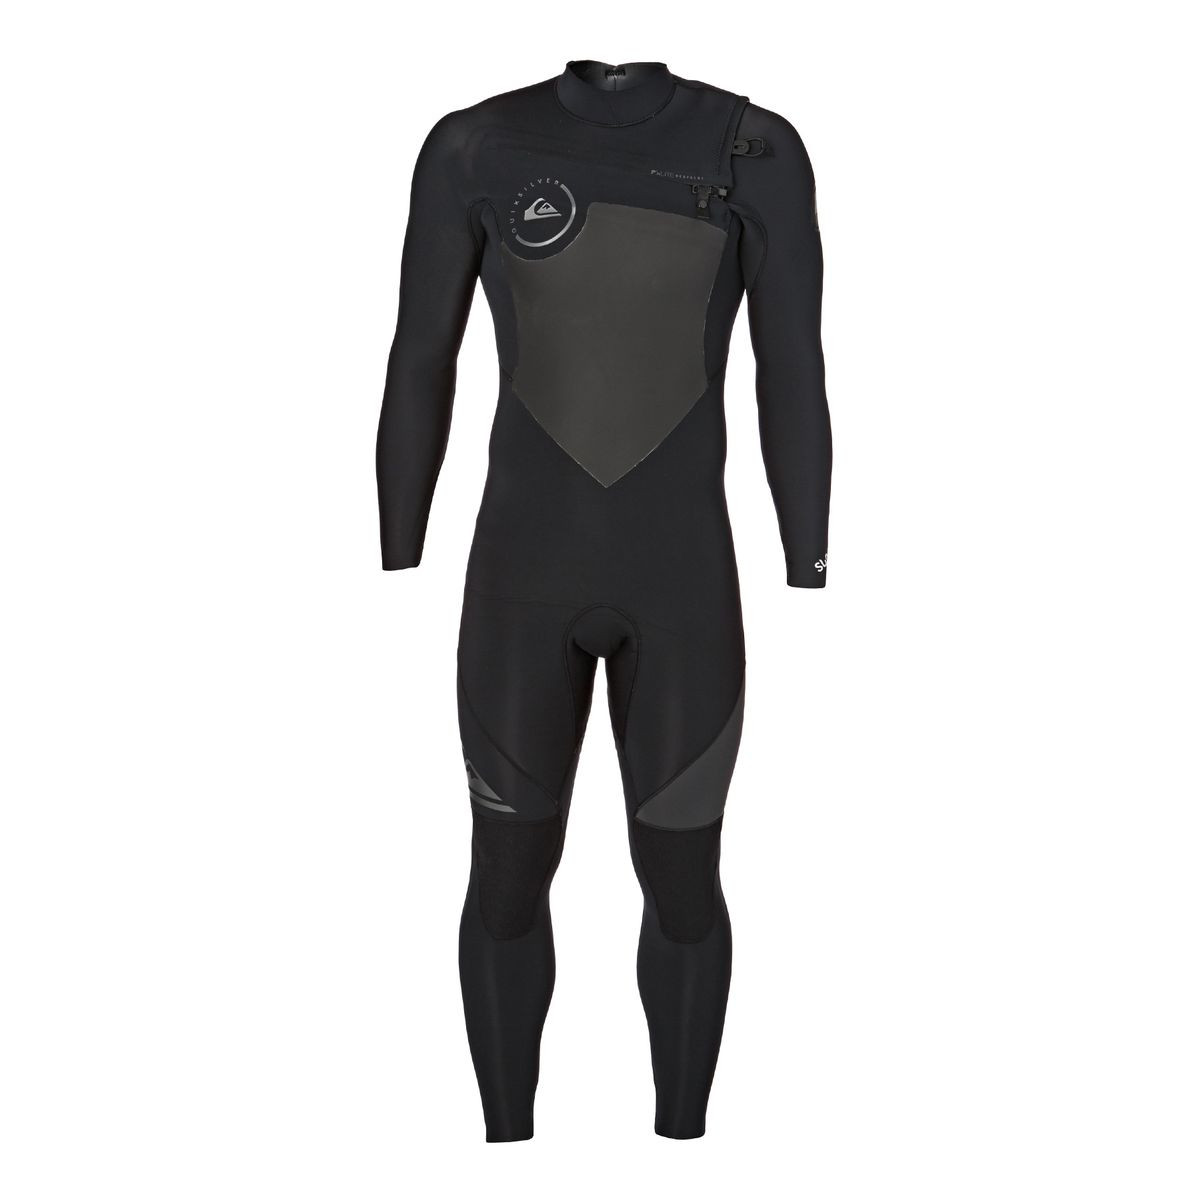 Men's Quiksilver Wetsuits - Quiksilver Syncro 4/3mm 2017 Chest Zip Wetsuit - Black